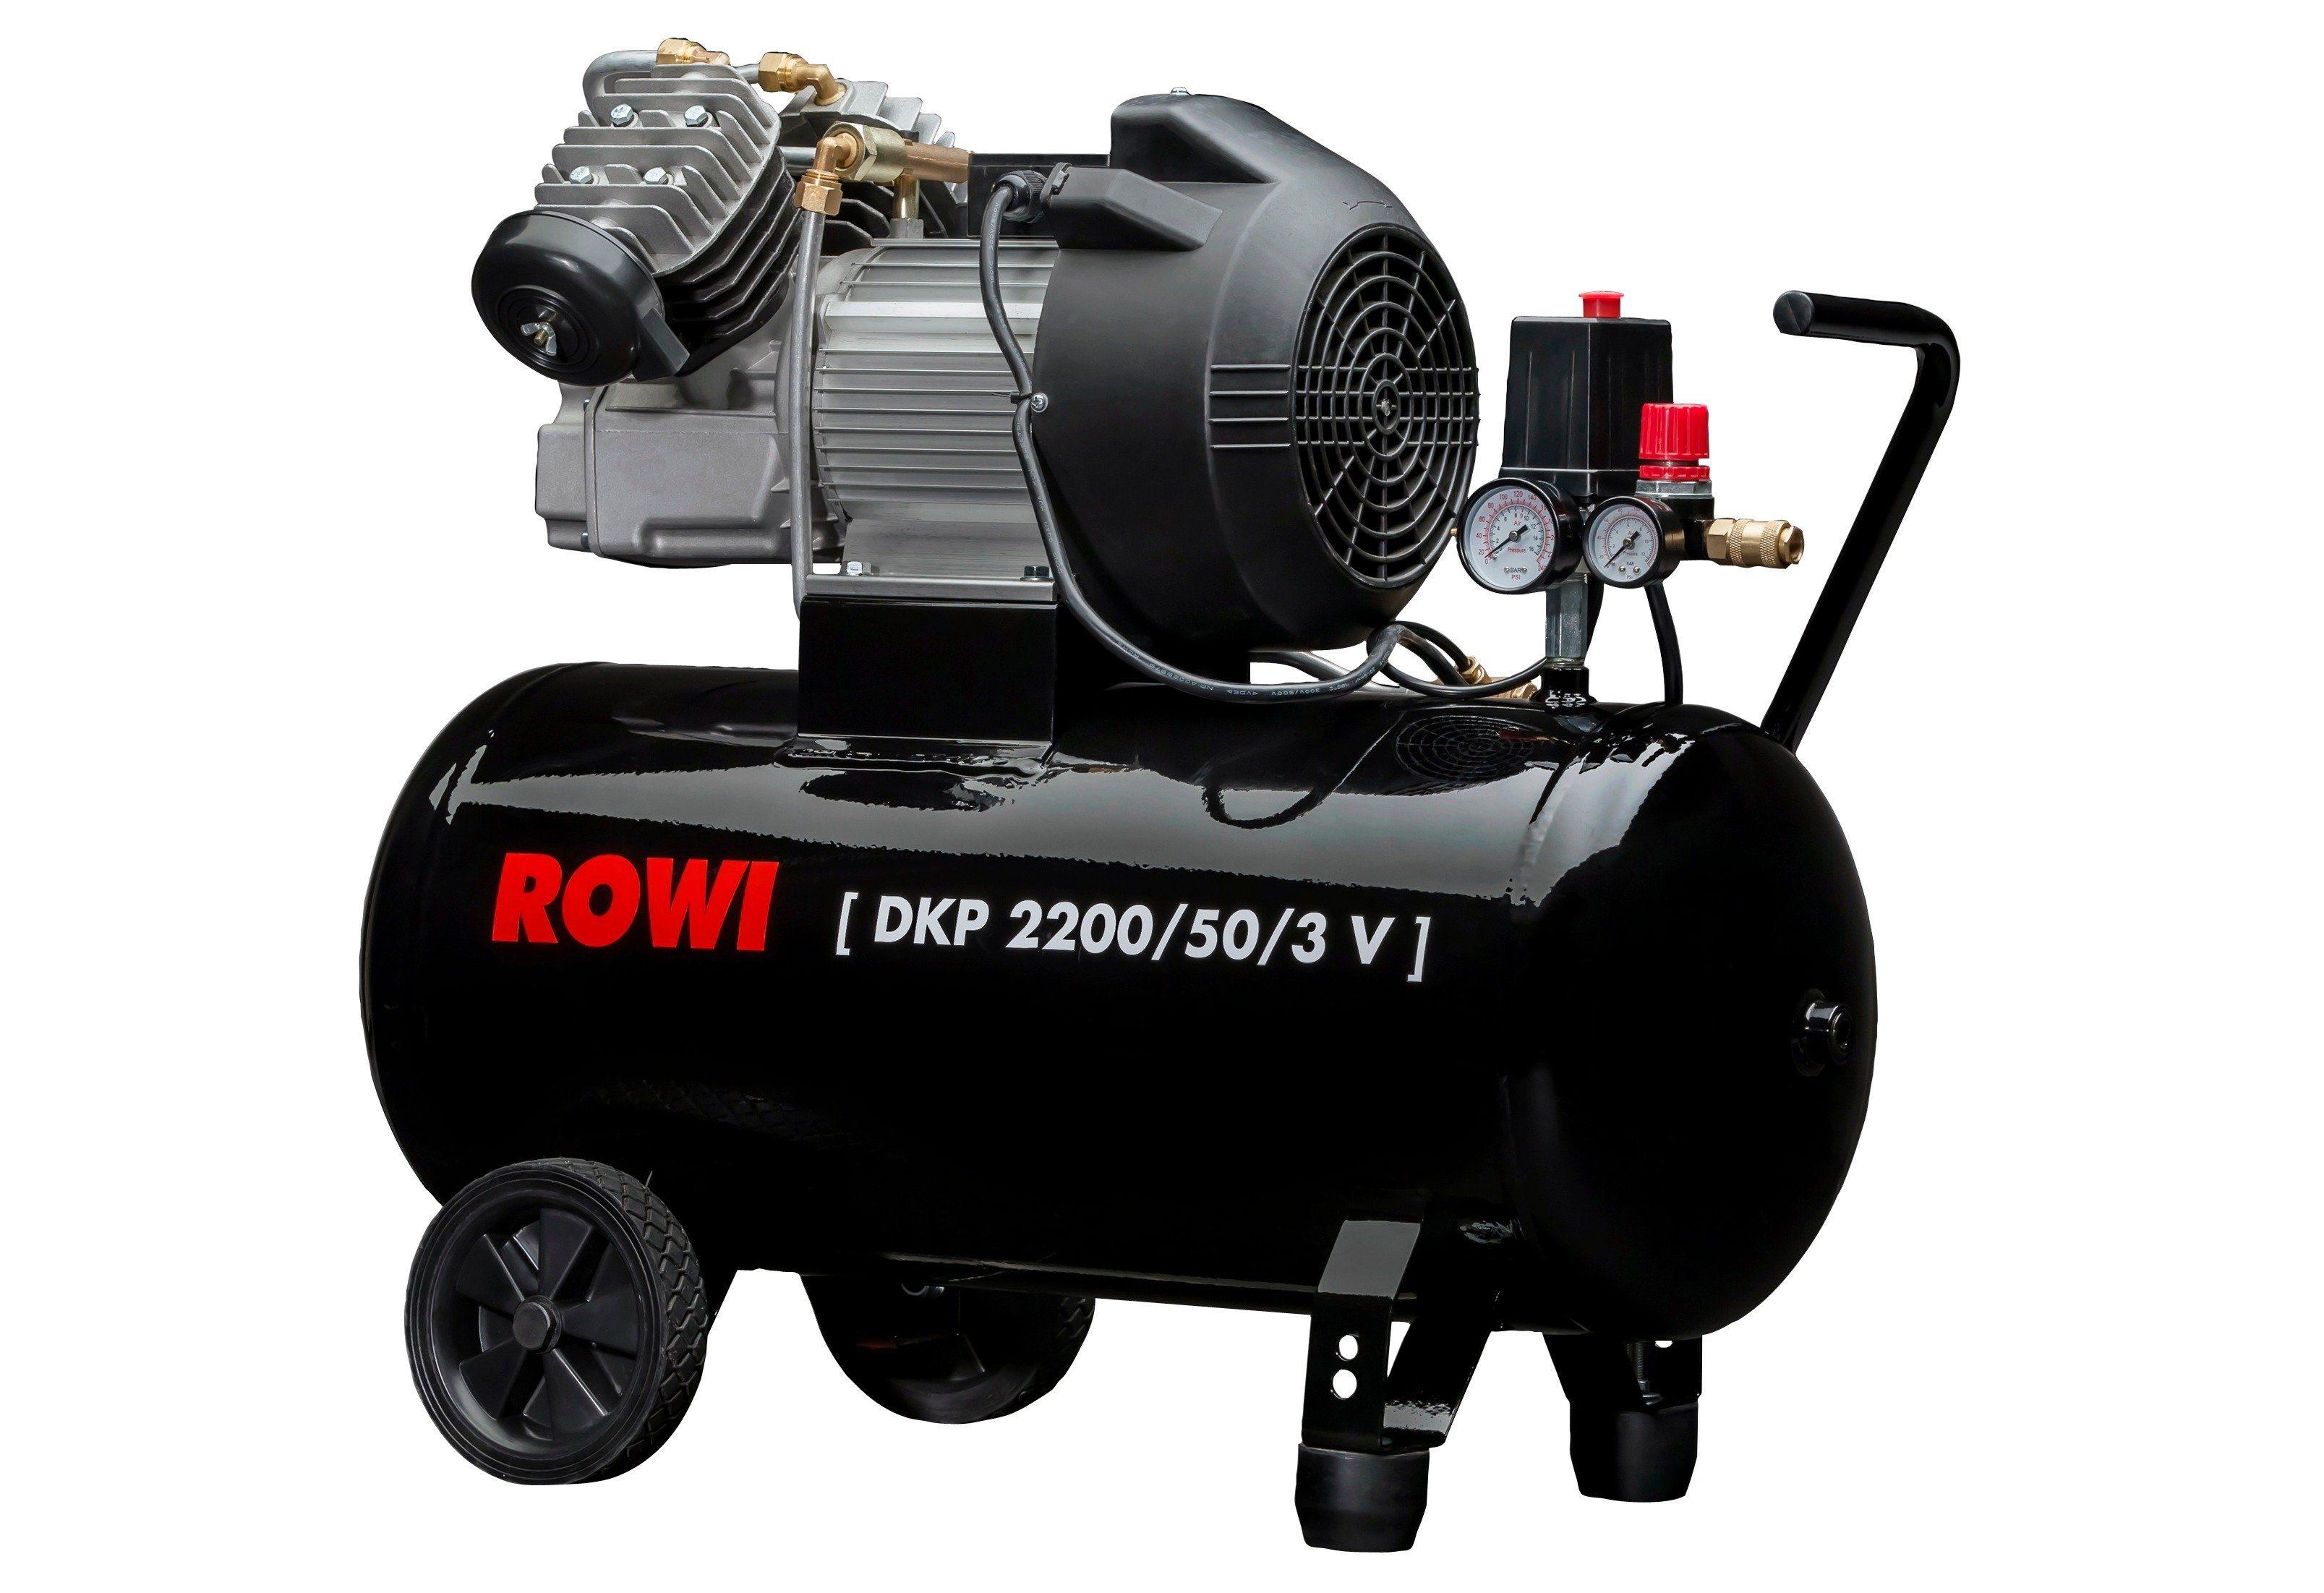 Rowi Kompressor »DKP 2200/50/3 V«